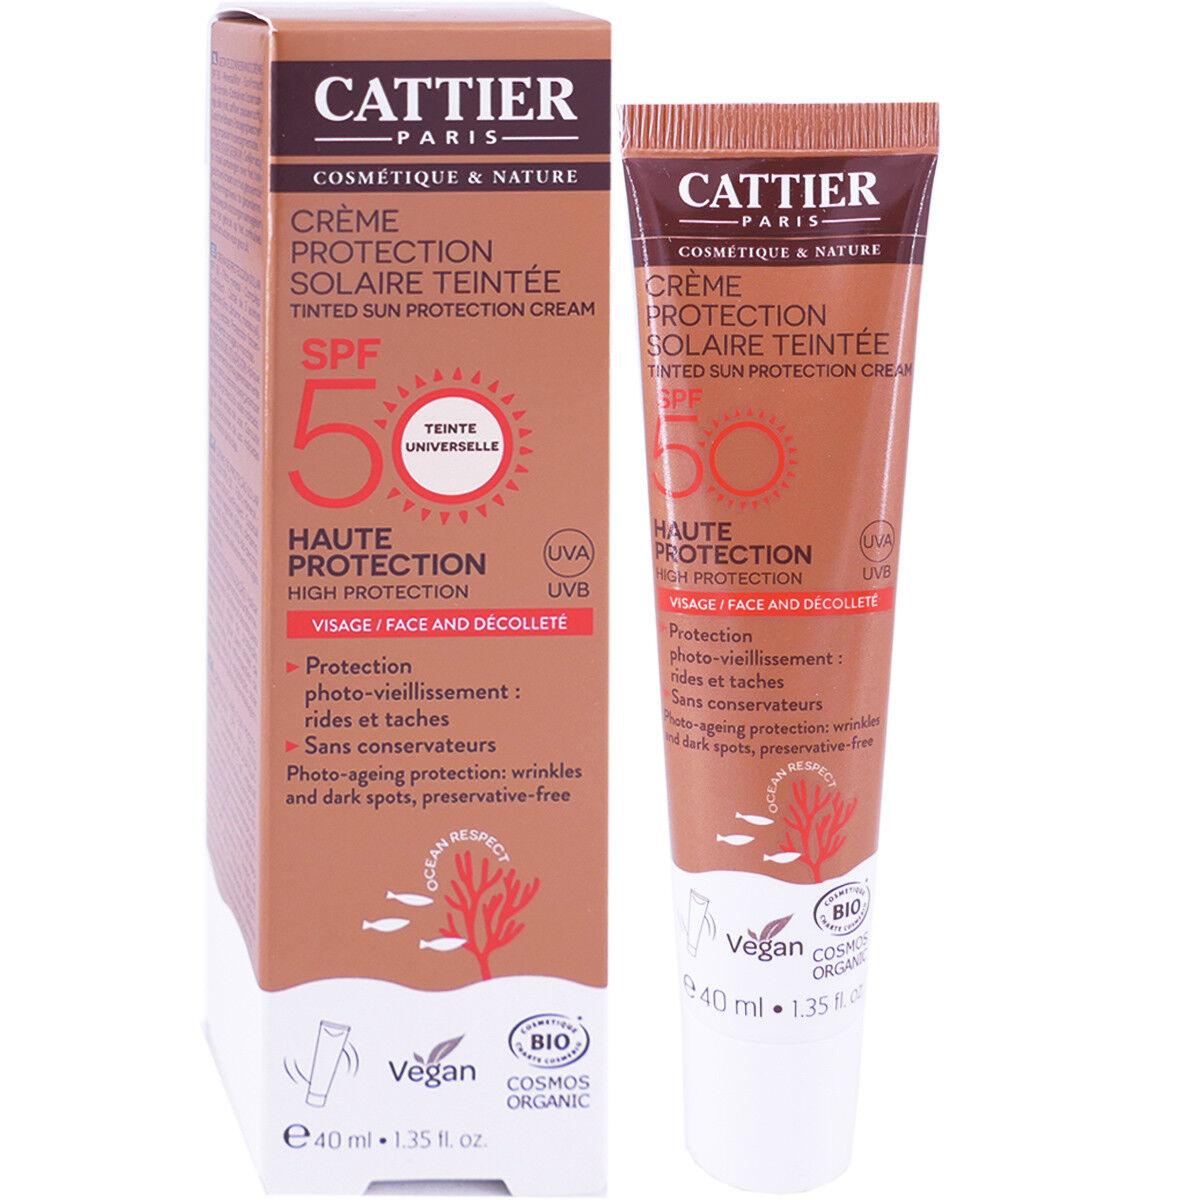 Cattier creme protection solaire teintee spf50 bio 40ml